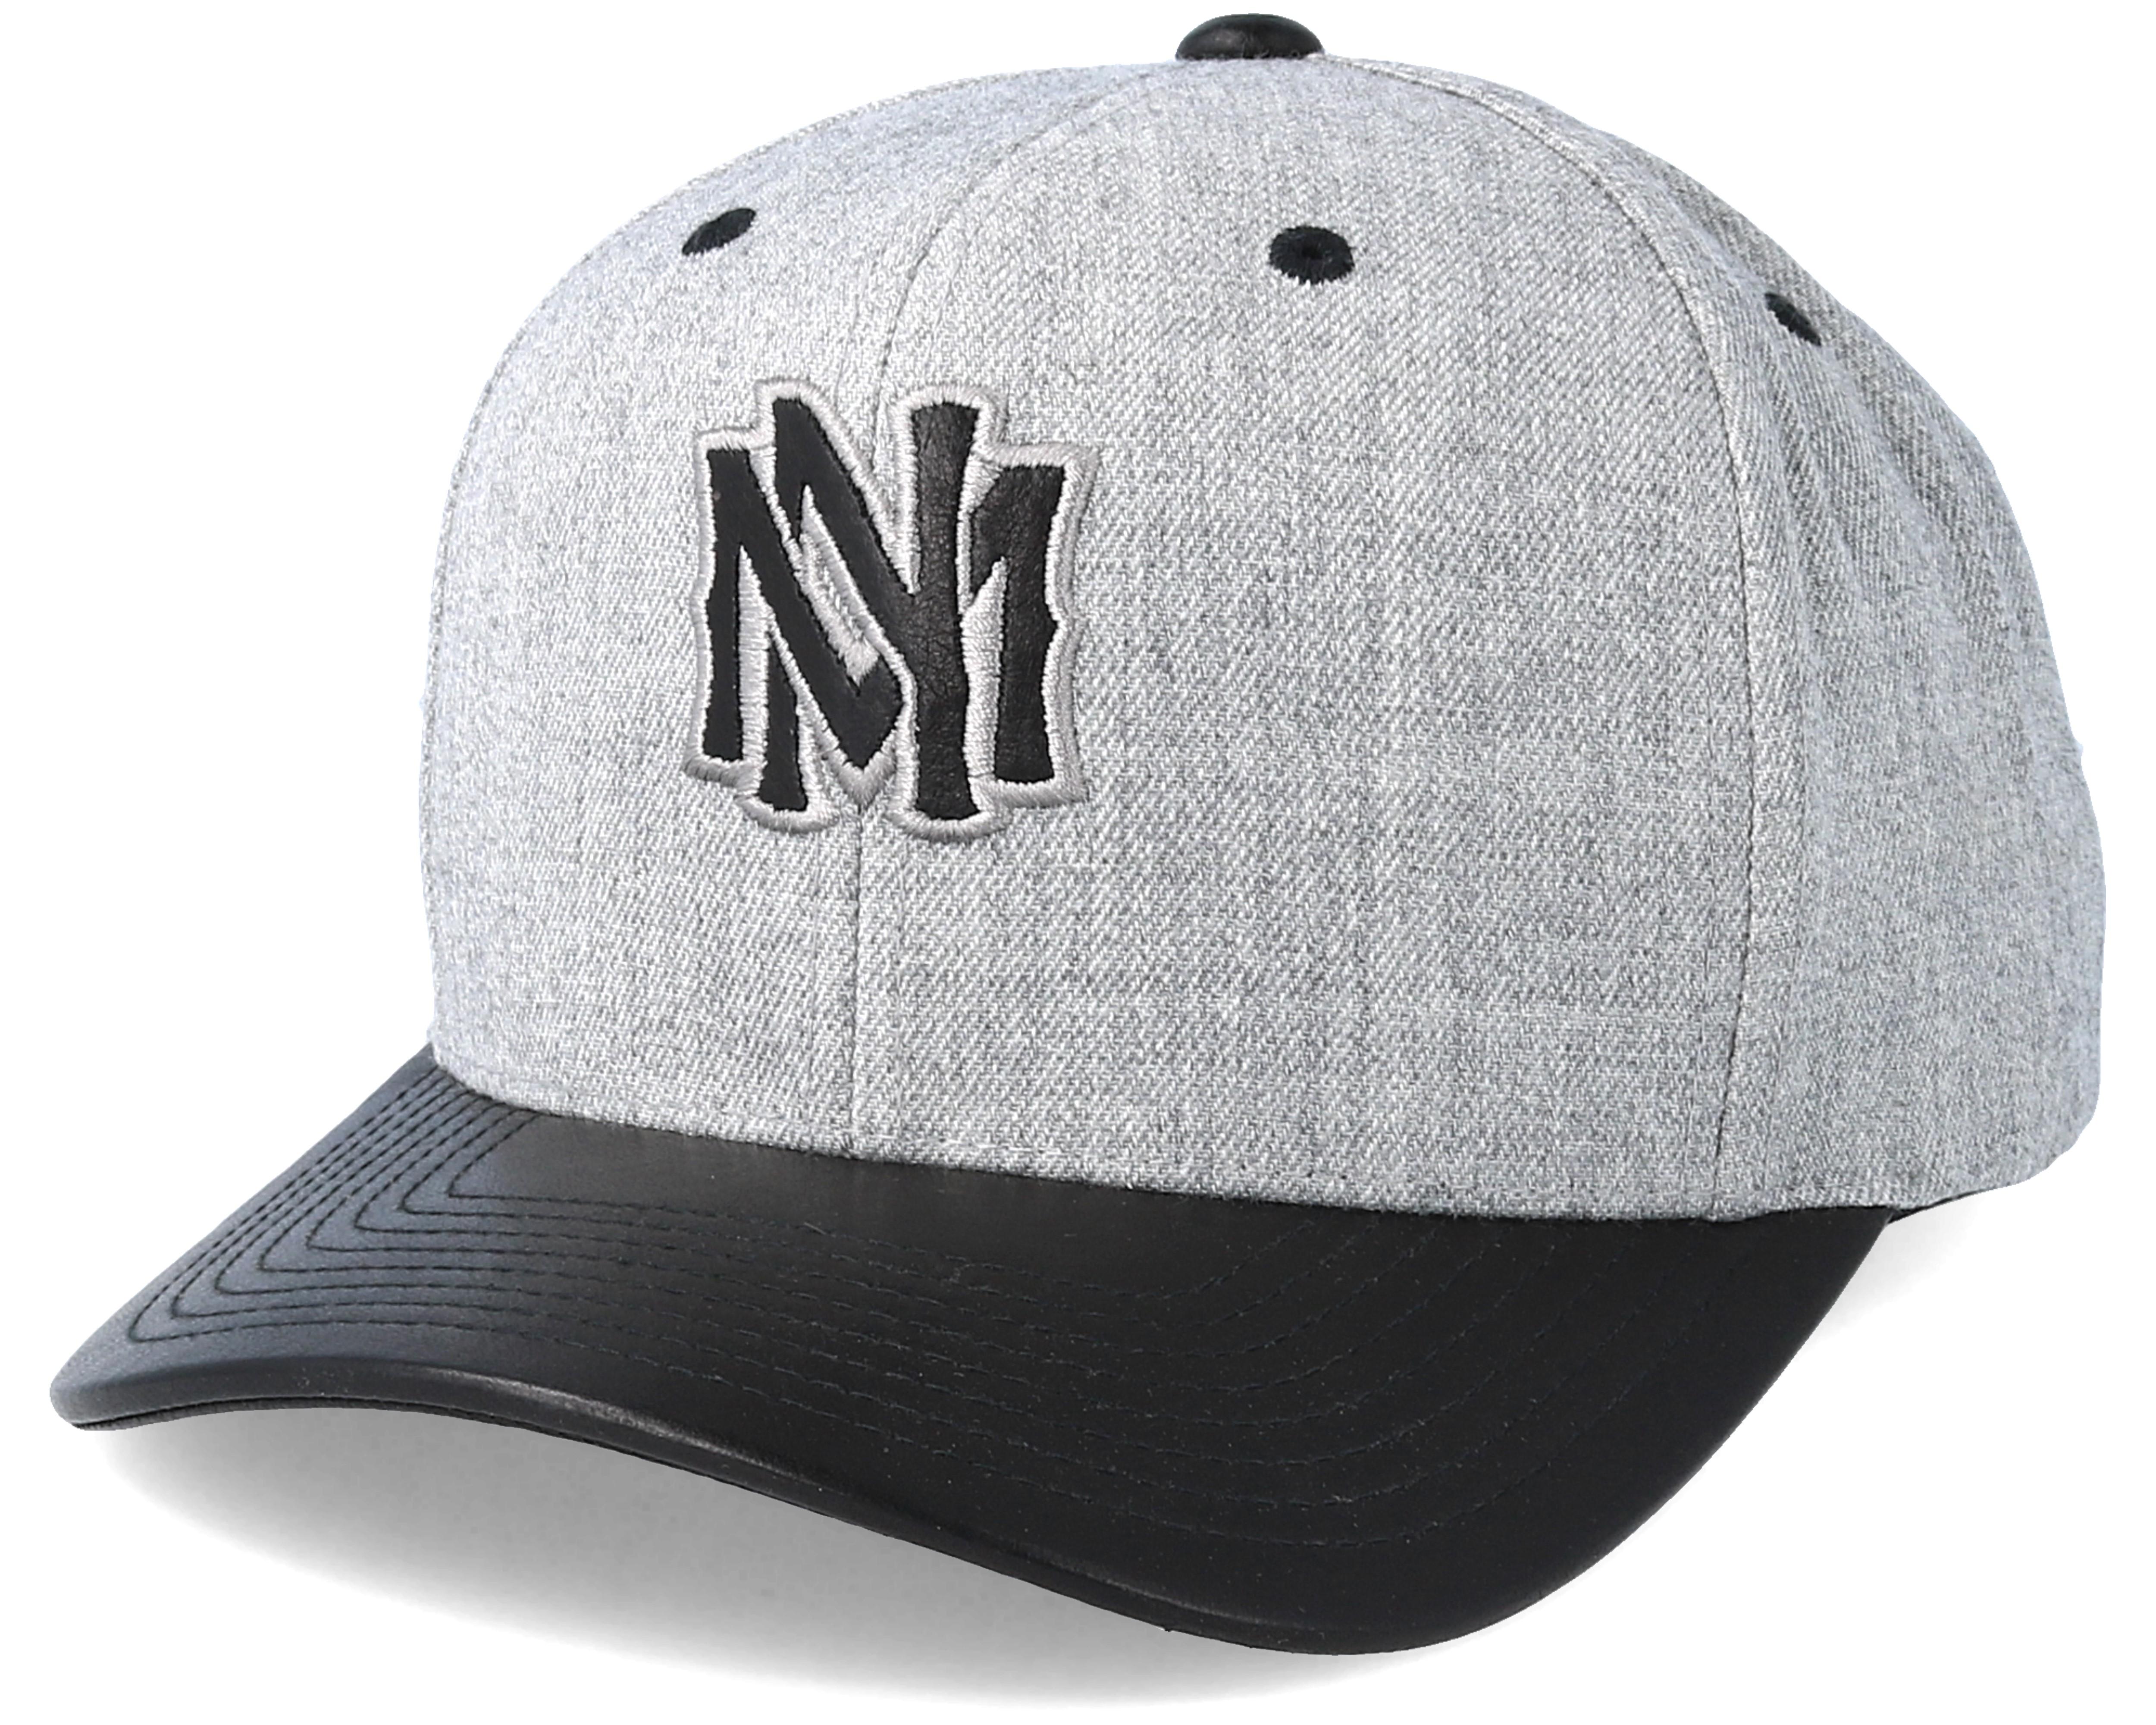 1ef3dc32a49a75 Vintage Top Shelf Curve Grey Adjustable - Mitchell & Ness caps ...